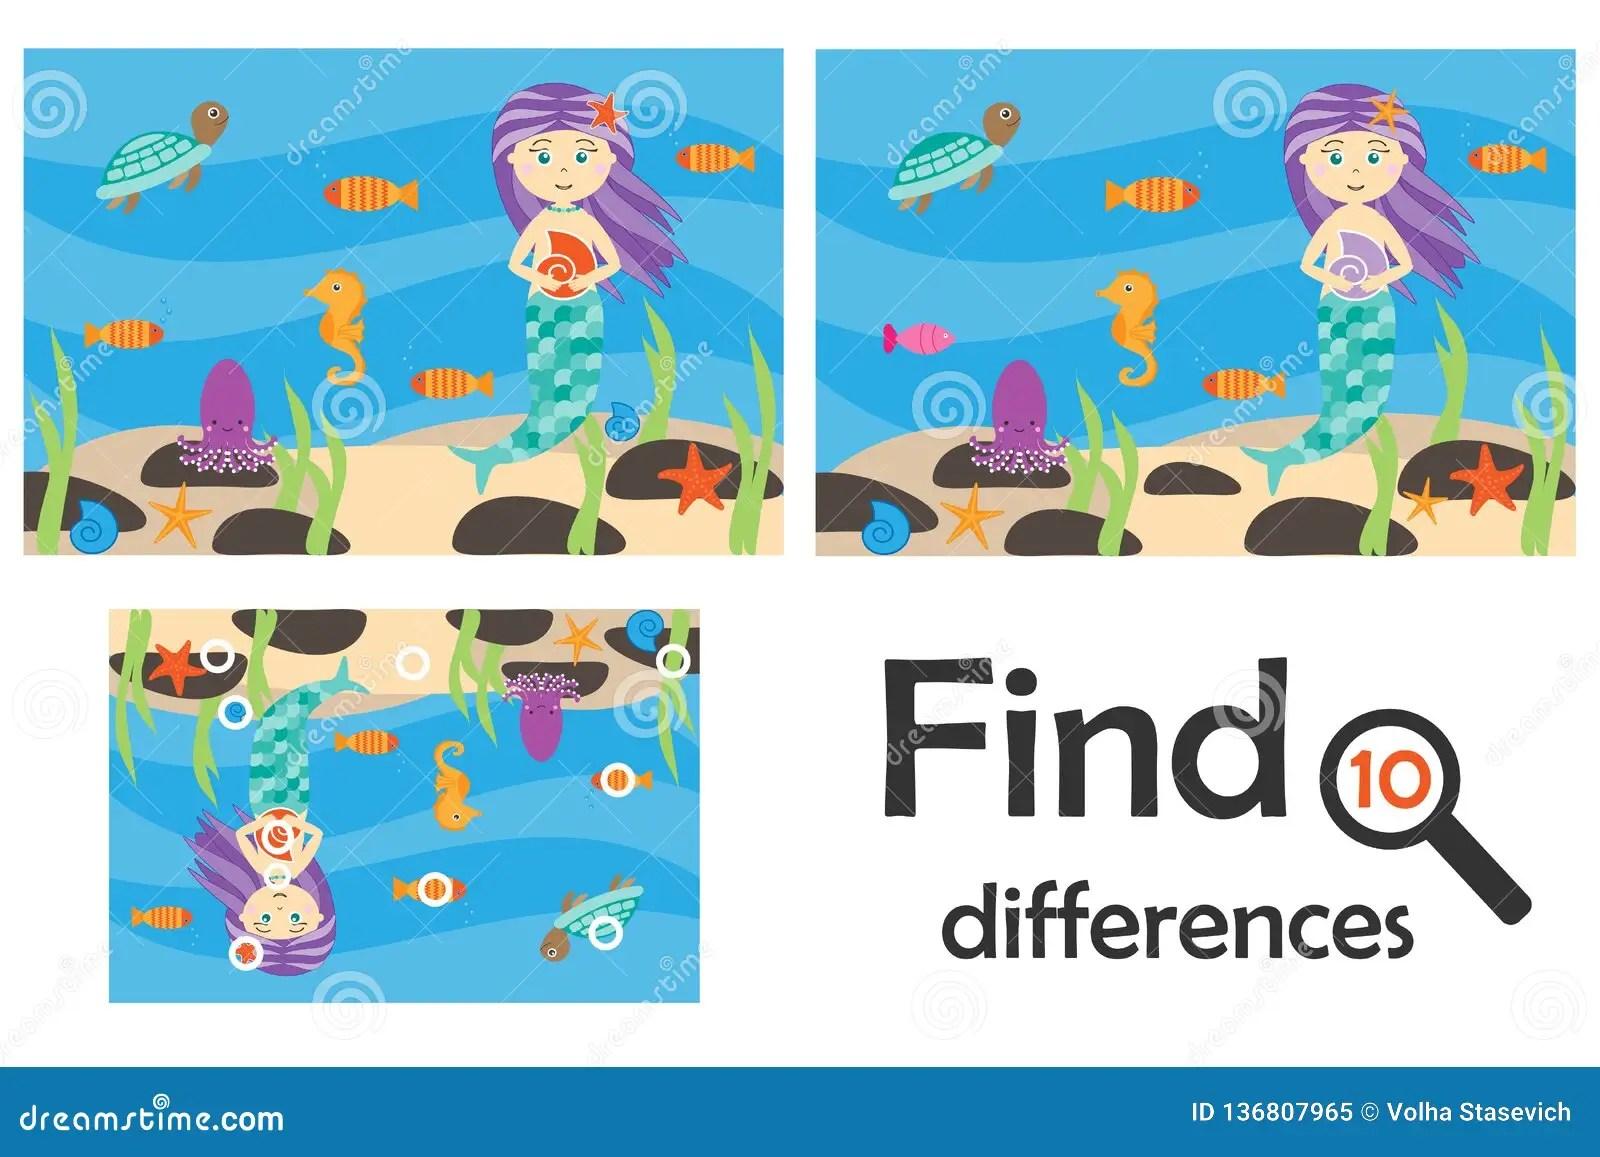 Find 10 Differences Game For Children Mermaid Underwater